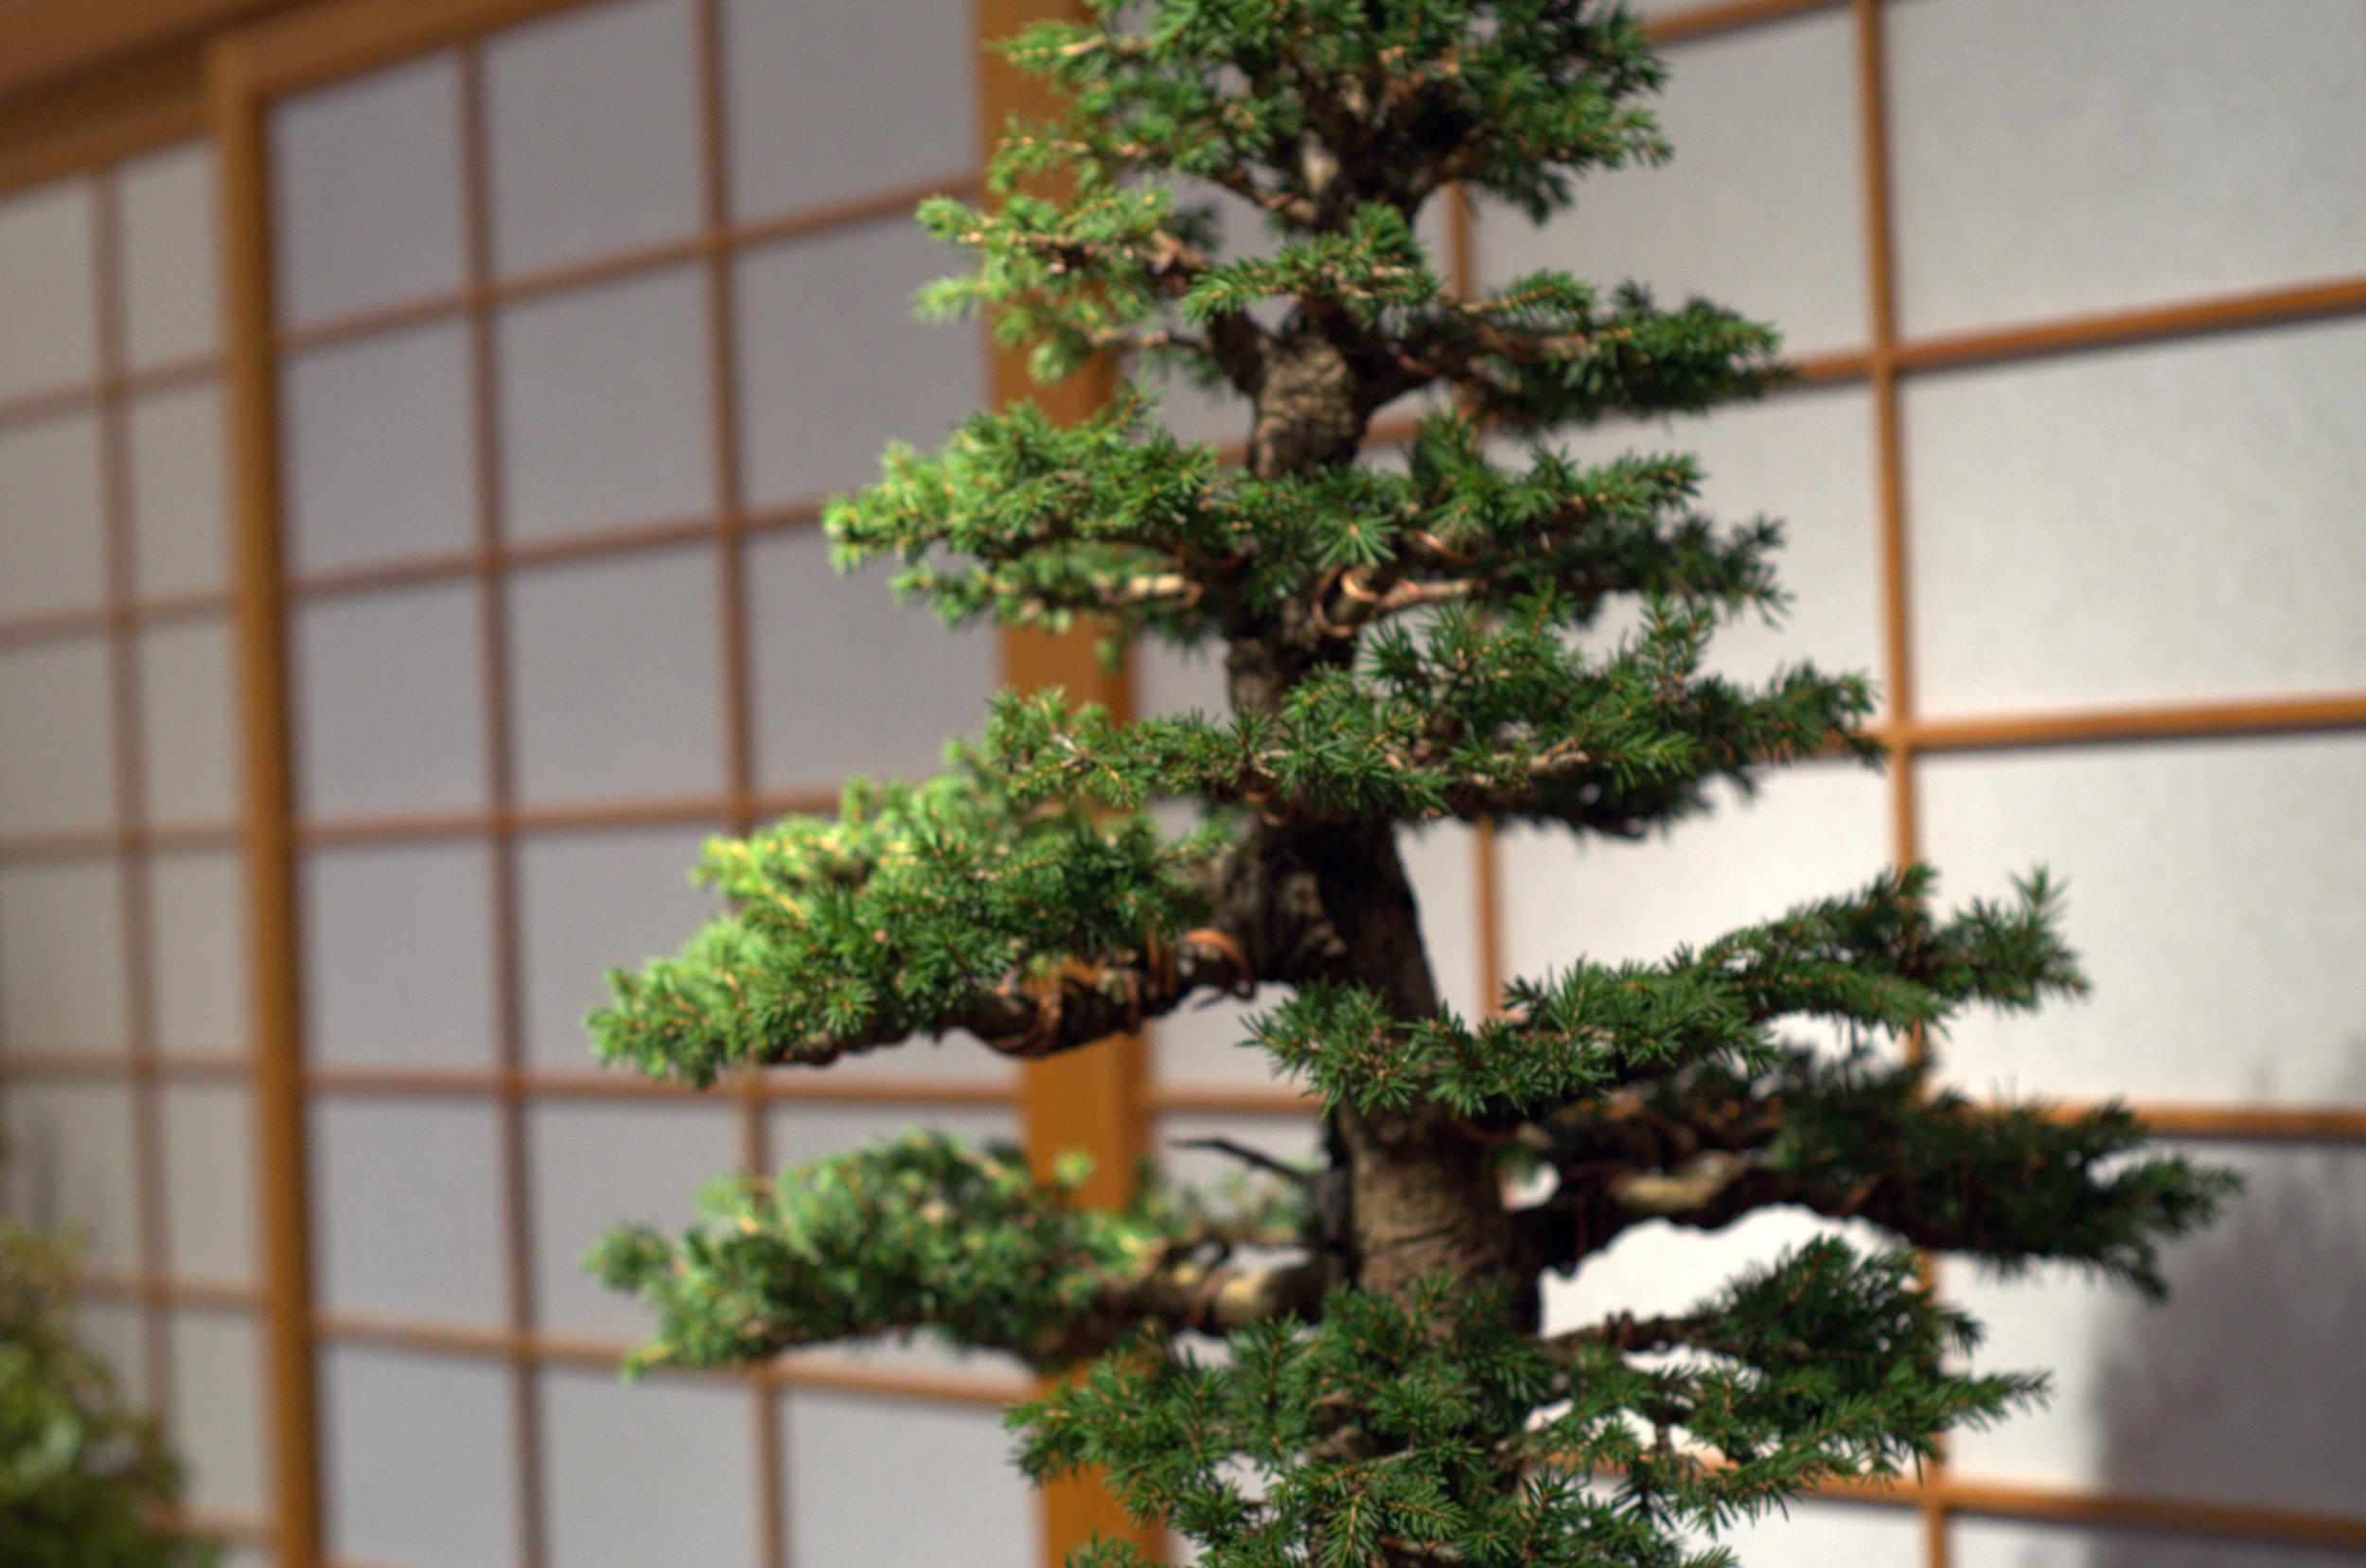 Bonsai museum in Portland, OR